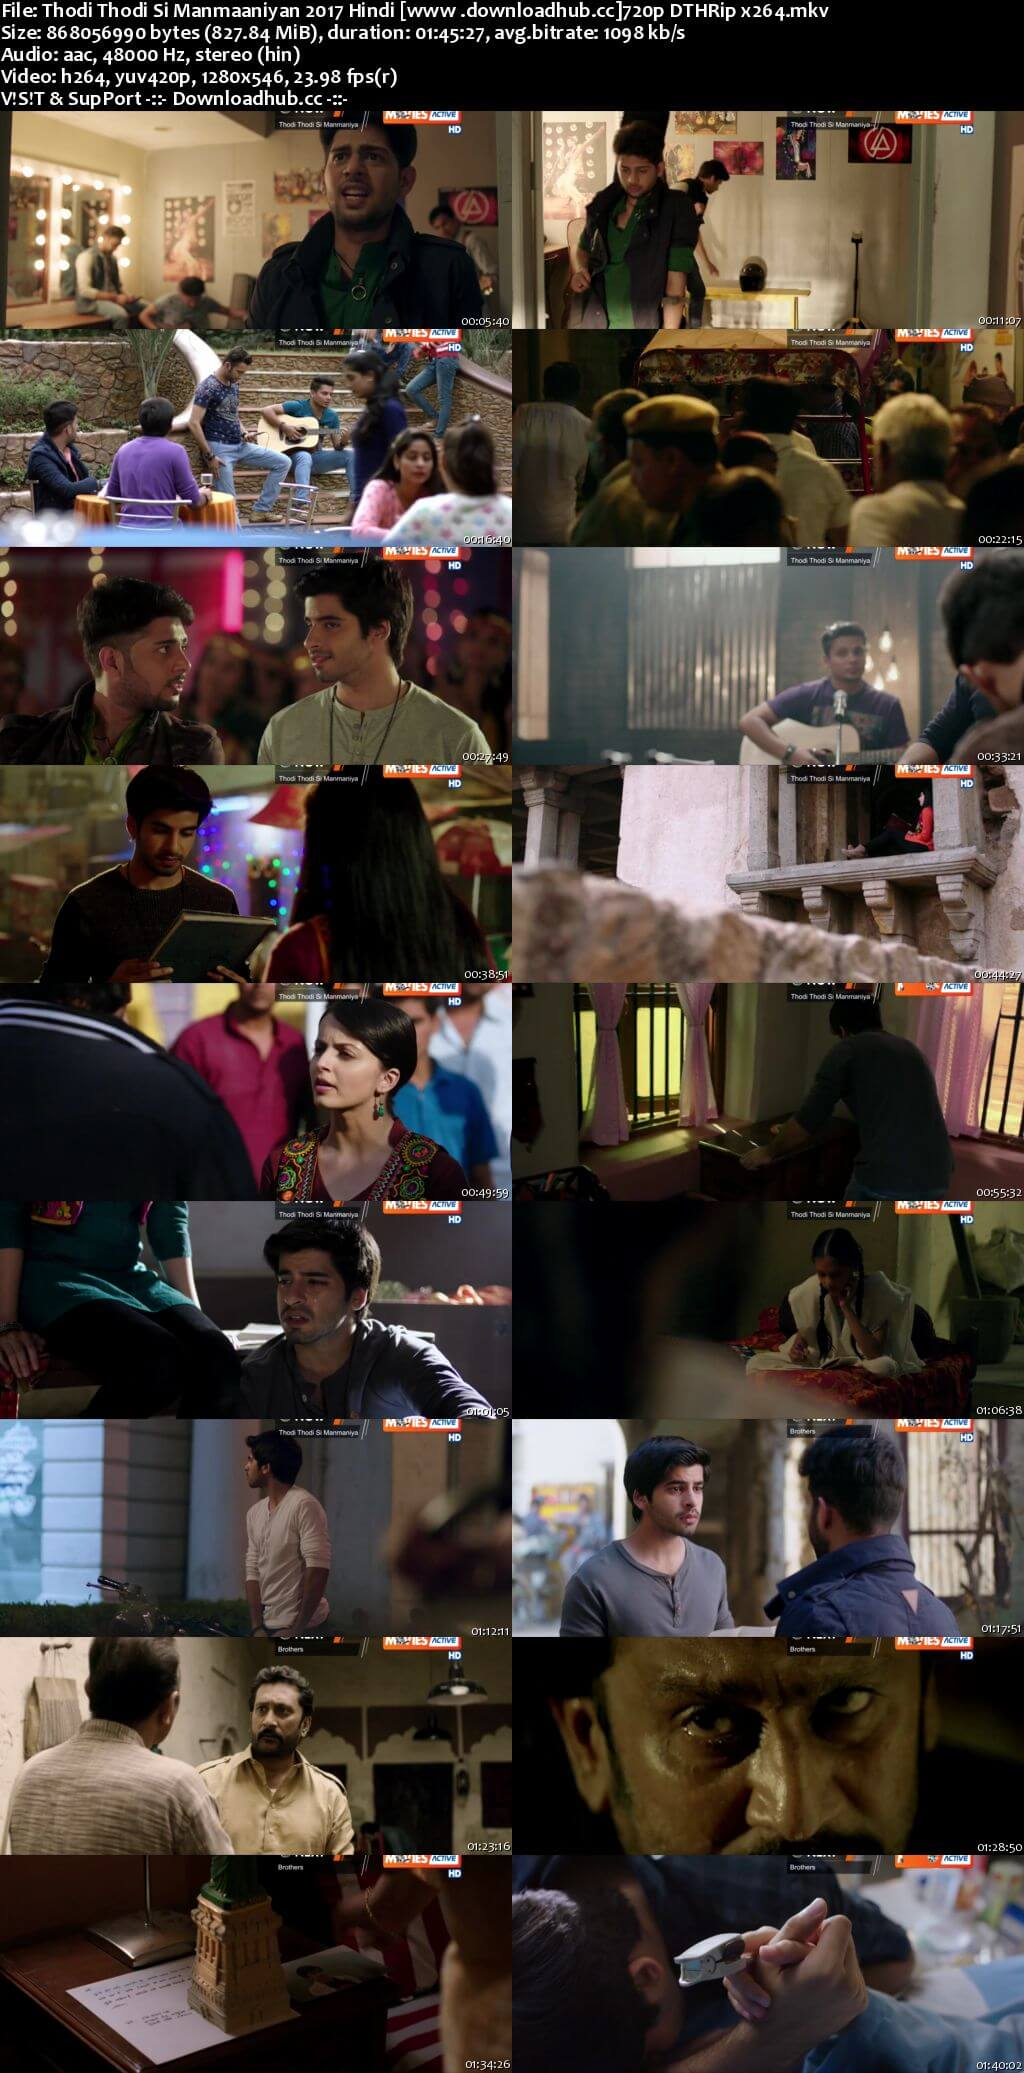 Thodi Thodi Si Manmaaniyan 2017 Hindi 720p DTHRip